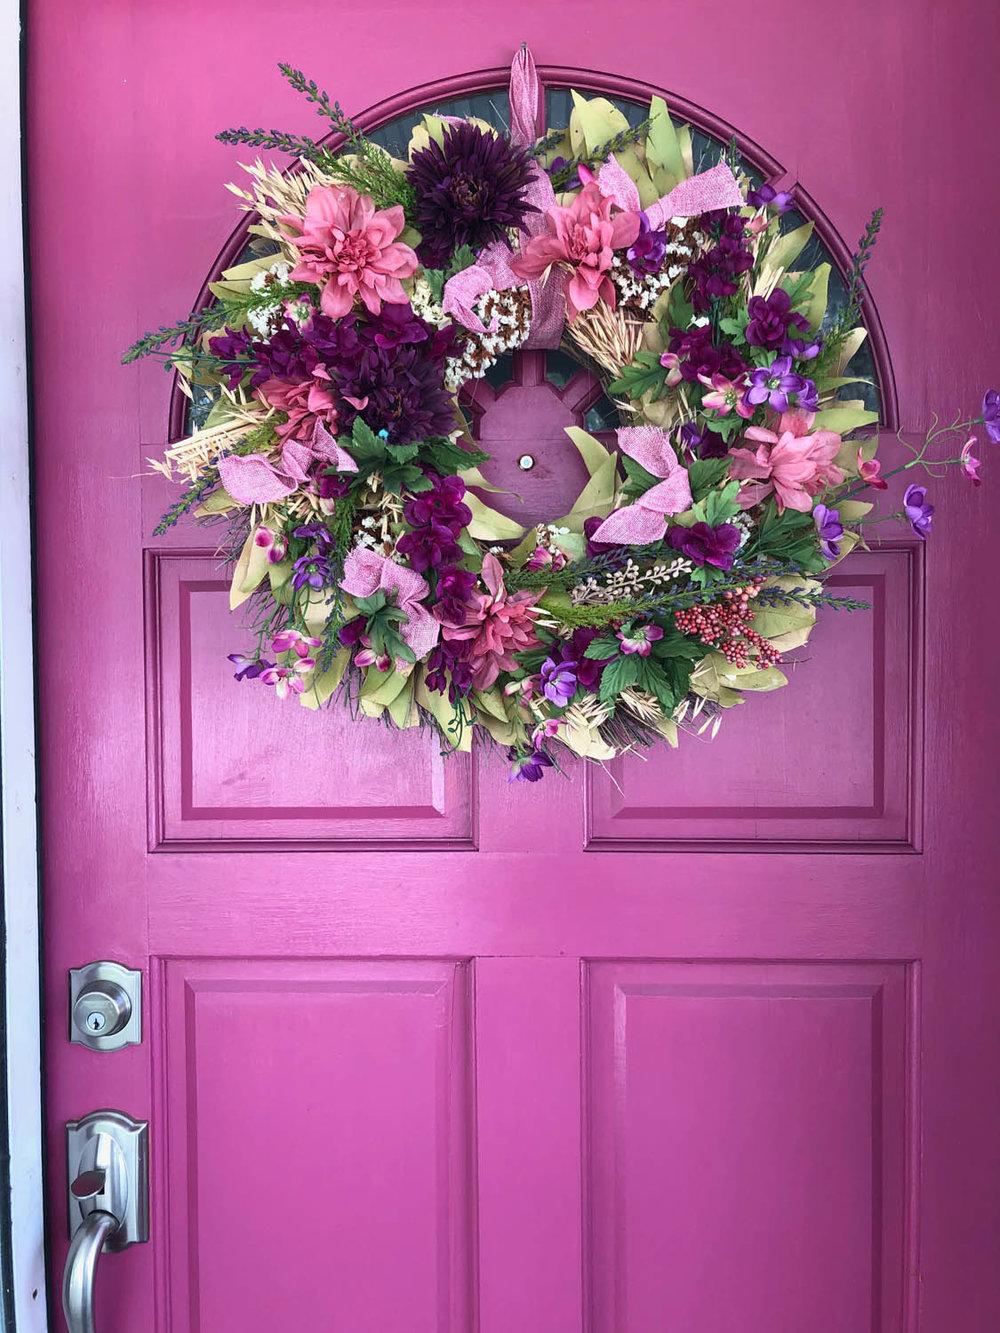 pink front door with spring floral wreath